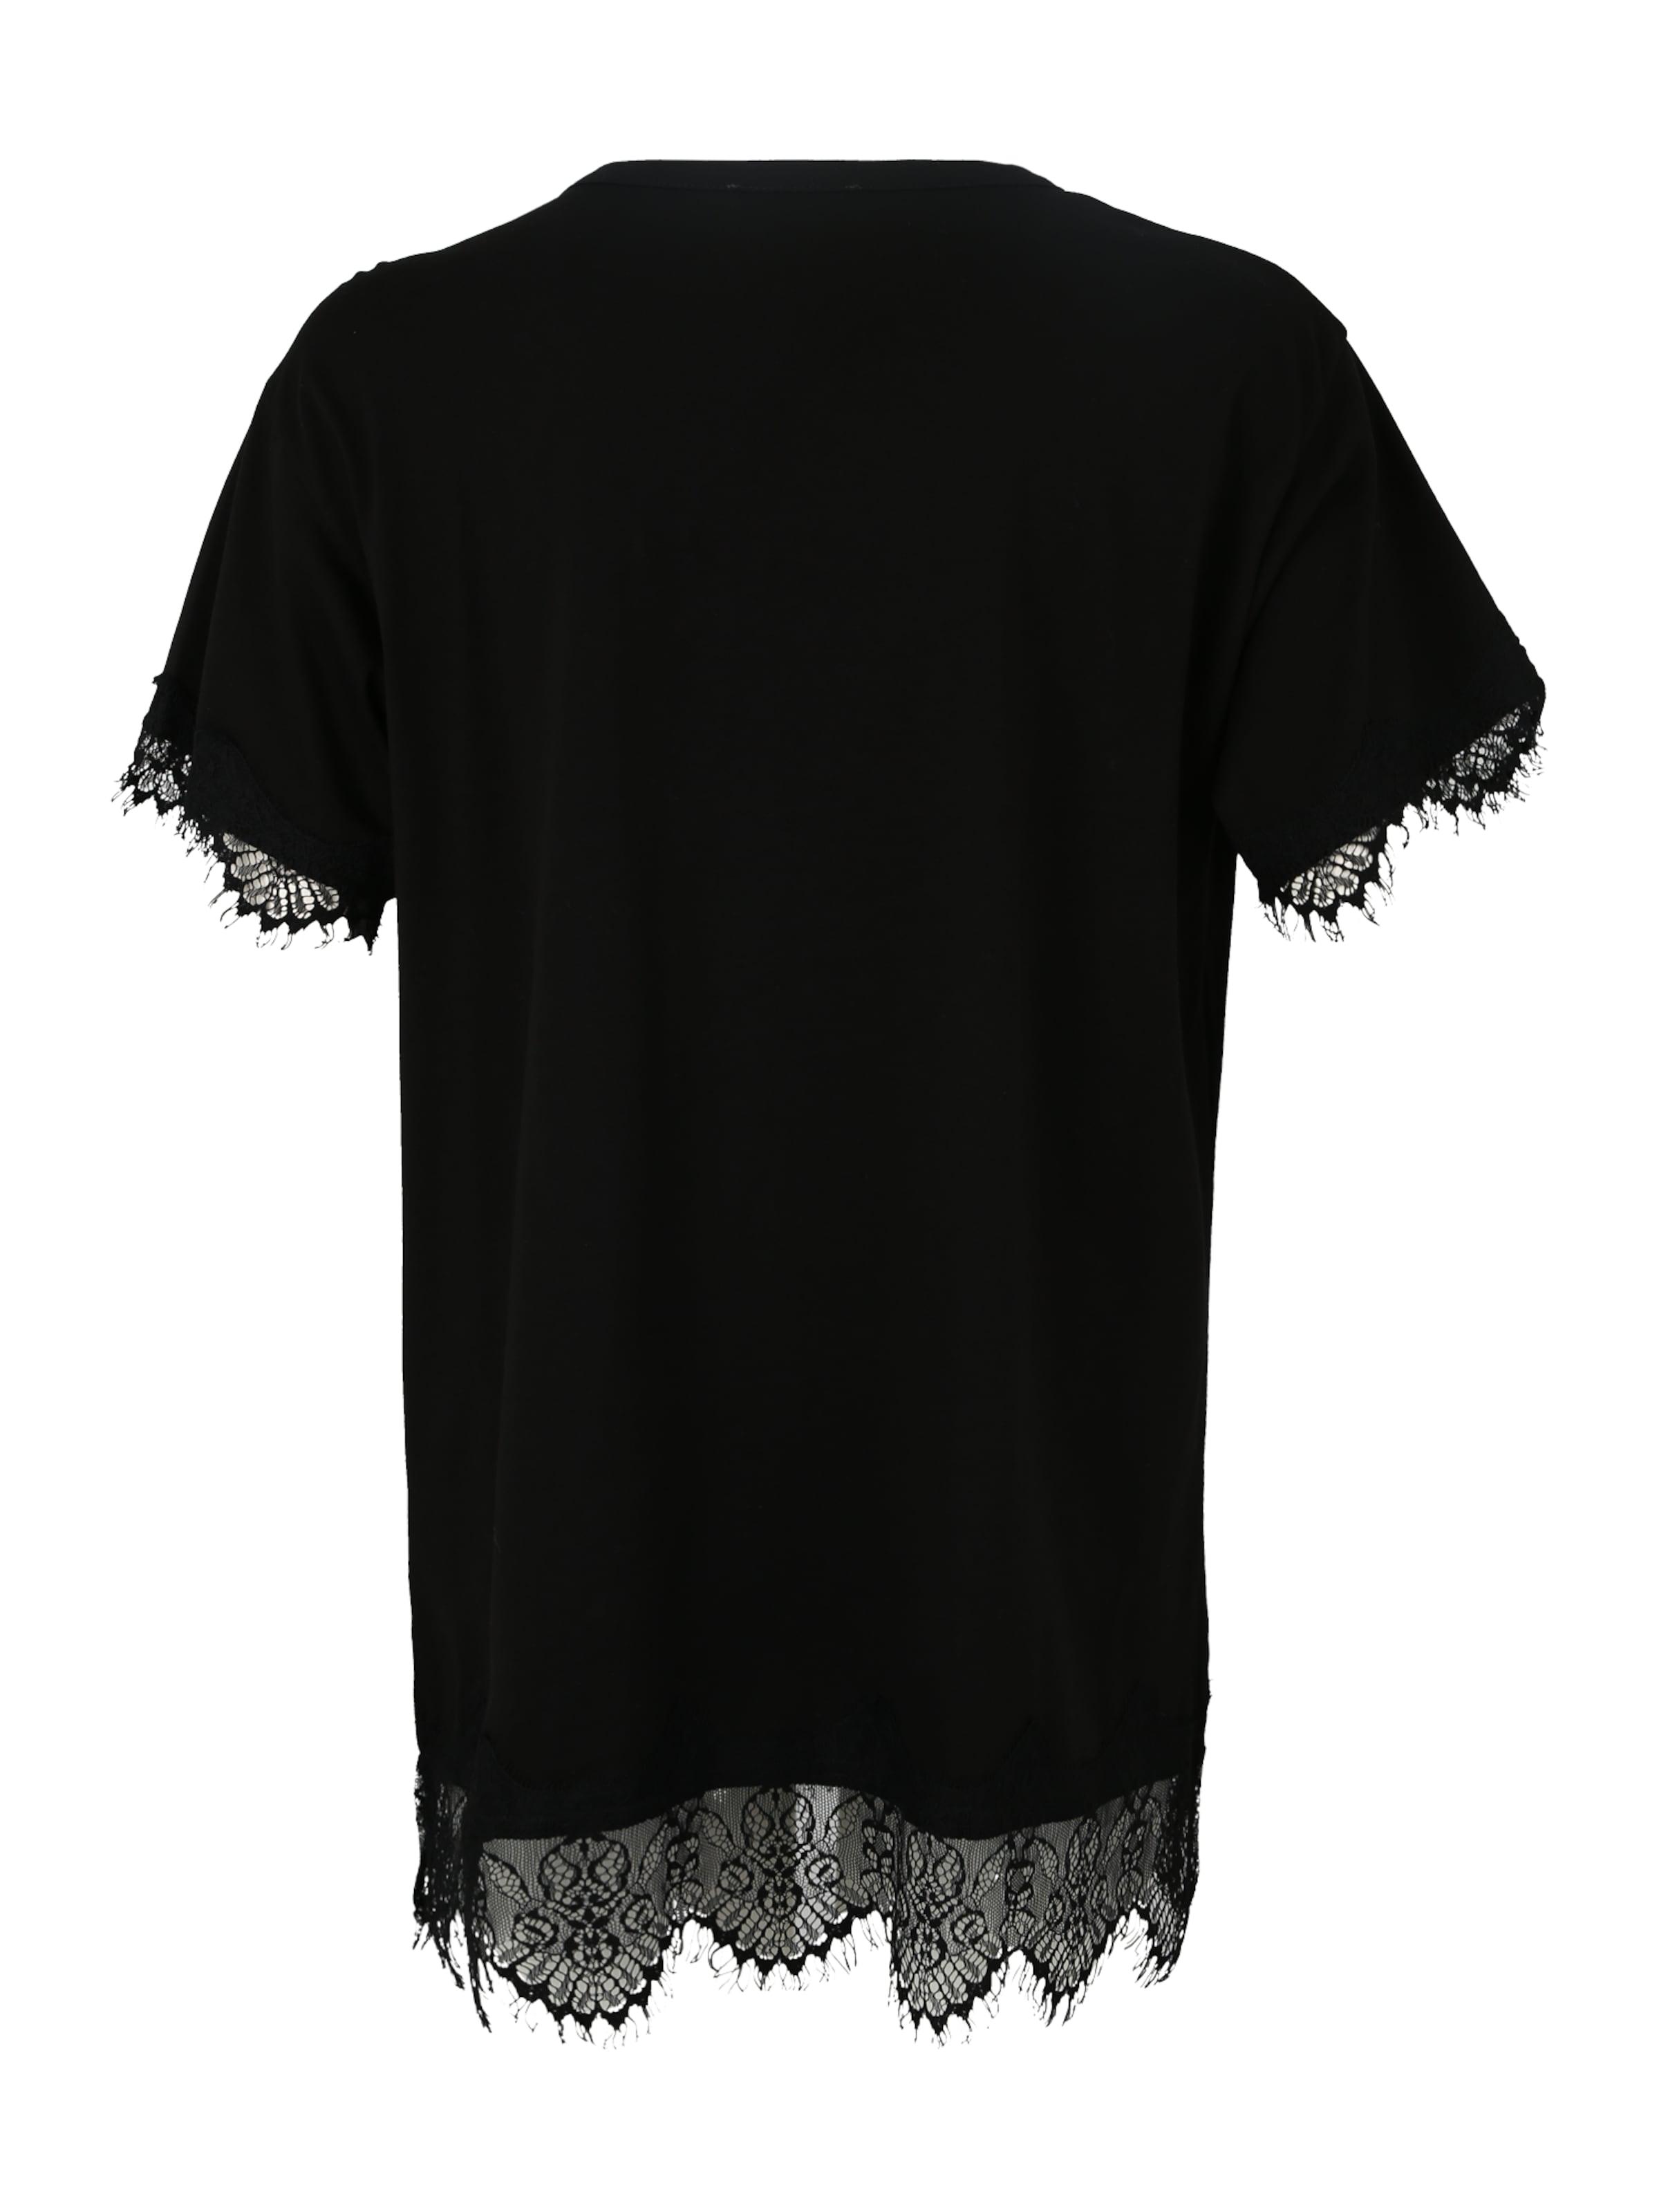 En Noir New Curves Look T shirt uFK1clJT35